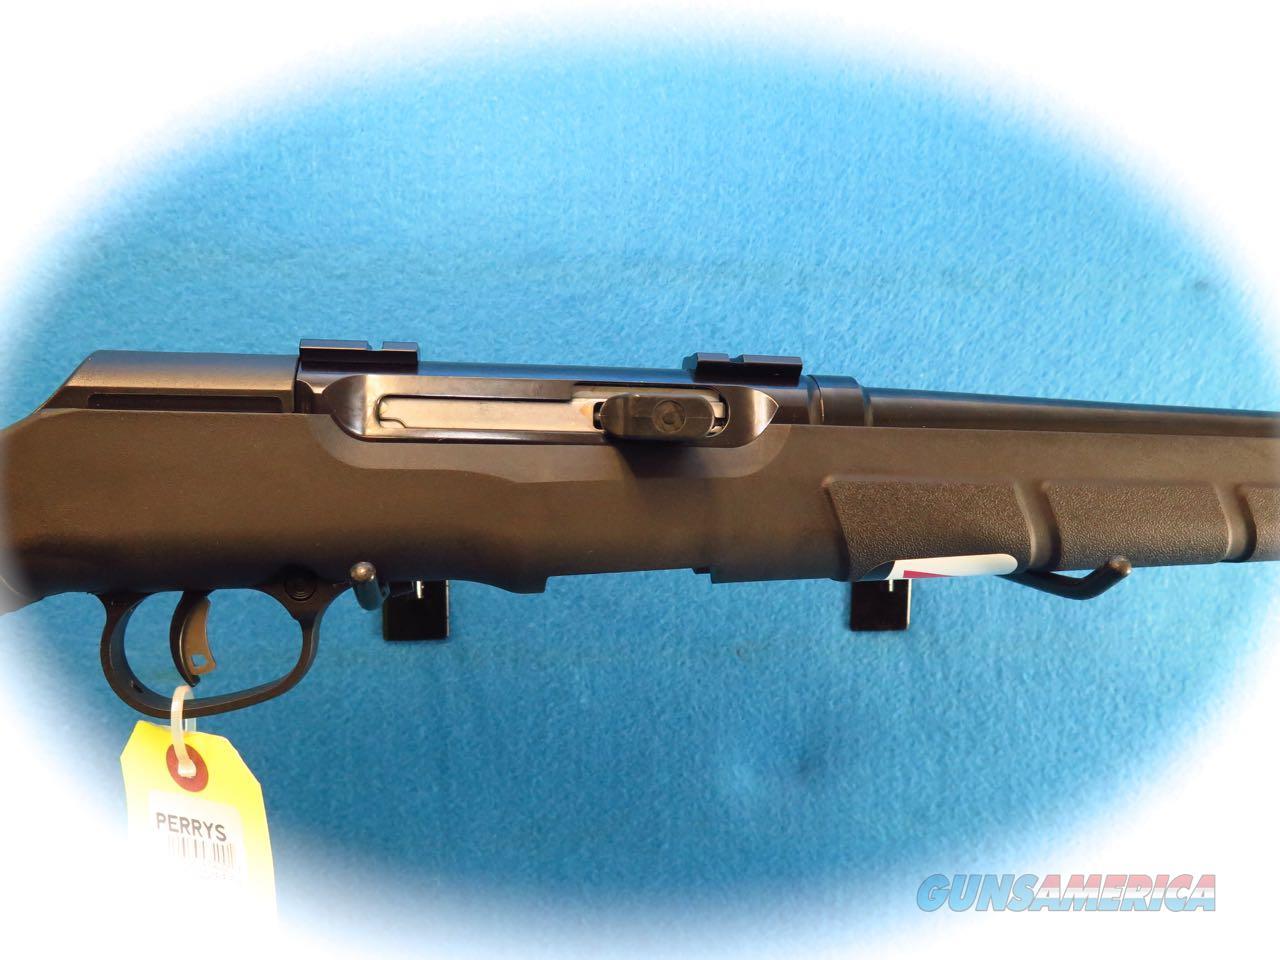 savage model a22 22 magnum semi auto rifle mod for sale